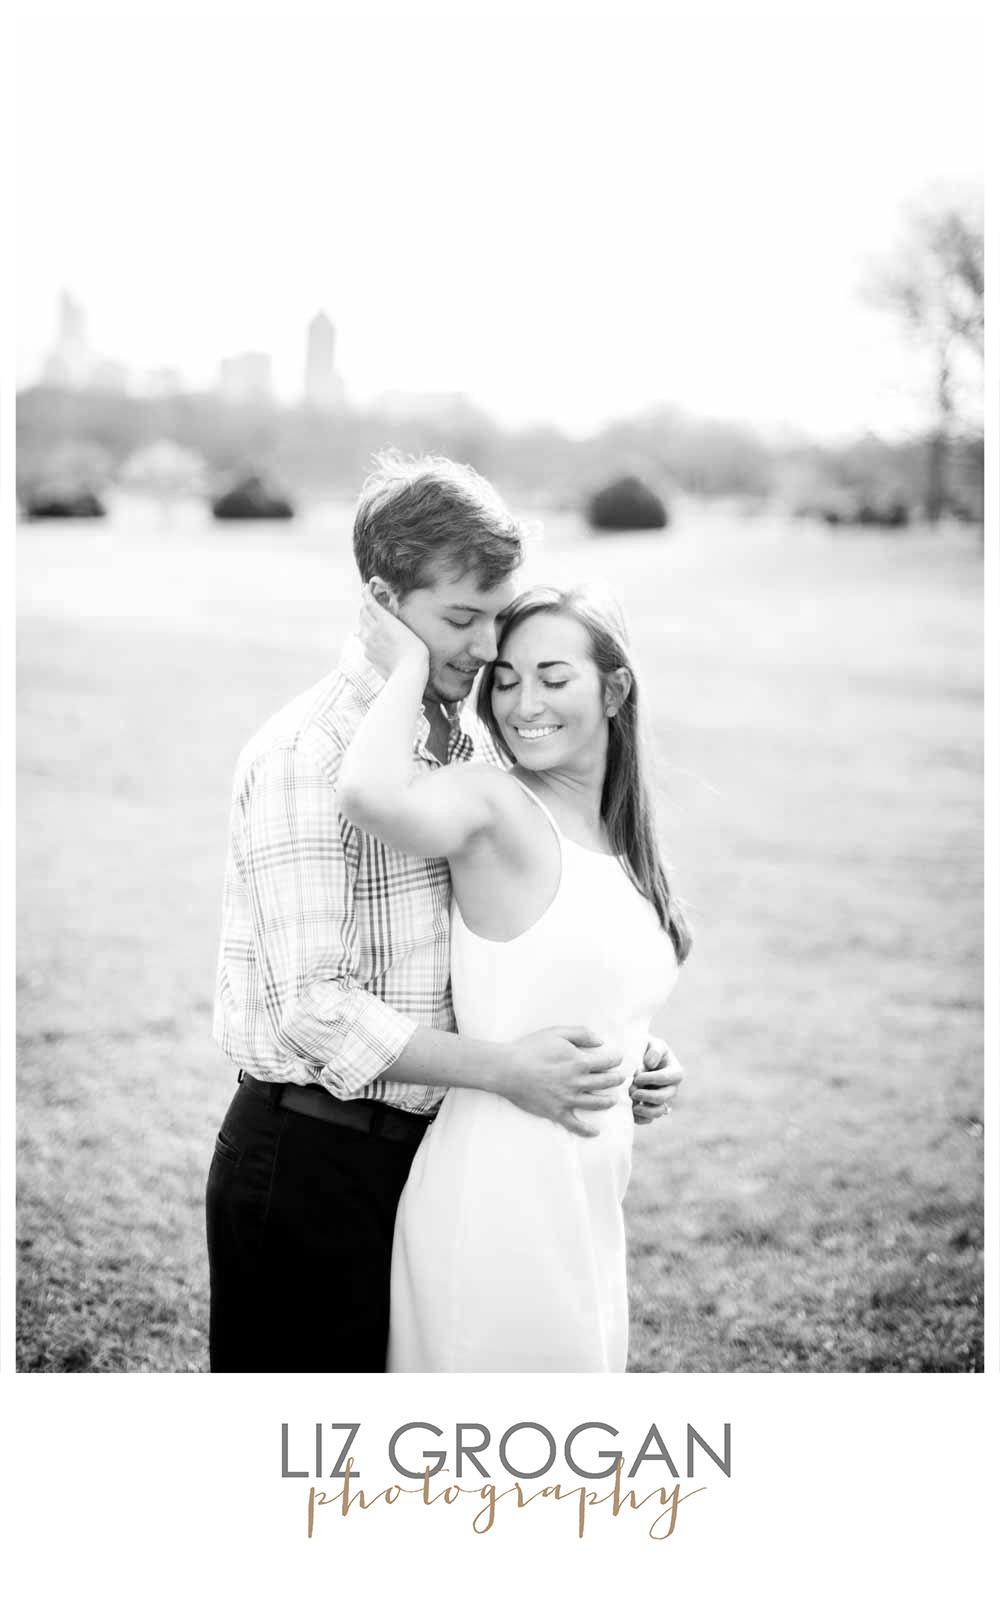 Charleston Wedding Photographer | Destination Wedding Photographer | North Carolina Wedding Photographer | Raleigh Wedding Photographer | Merrion Wynne House Wedding